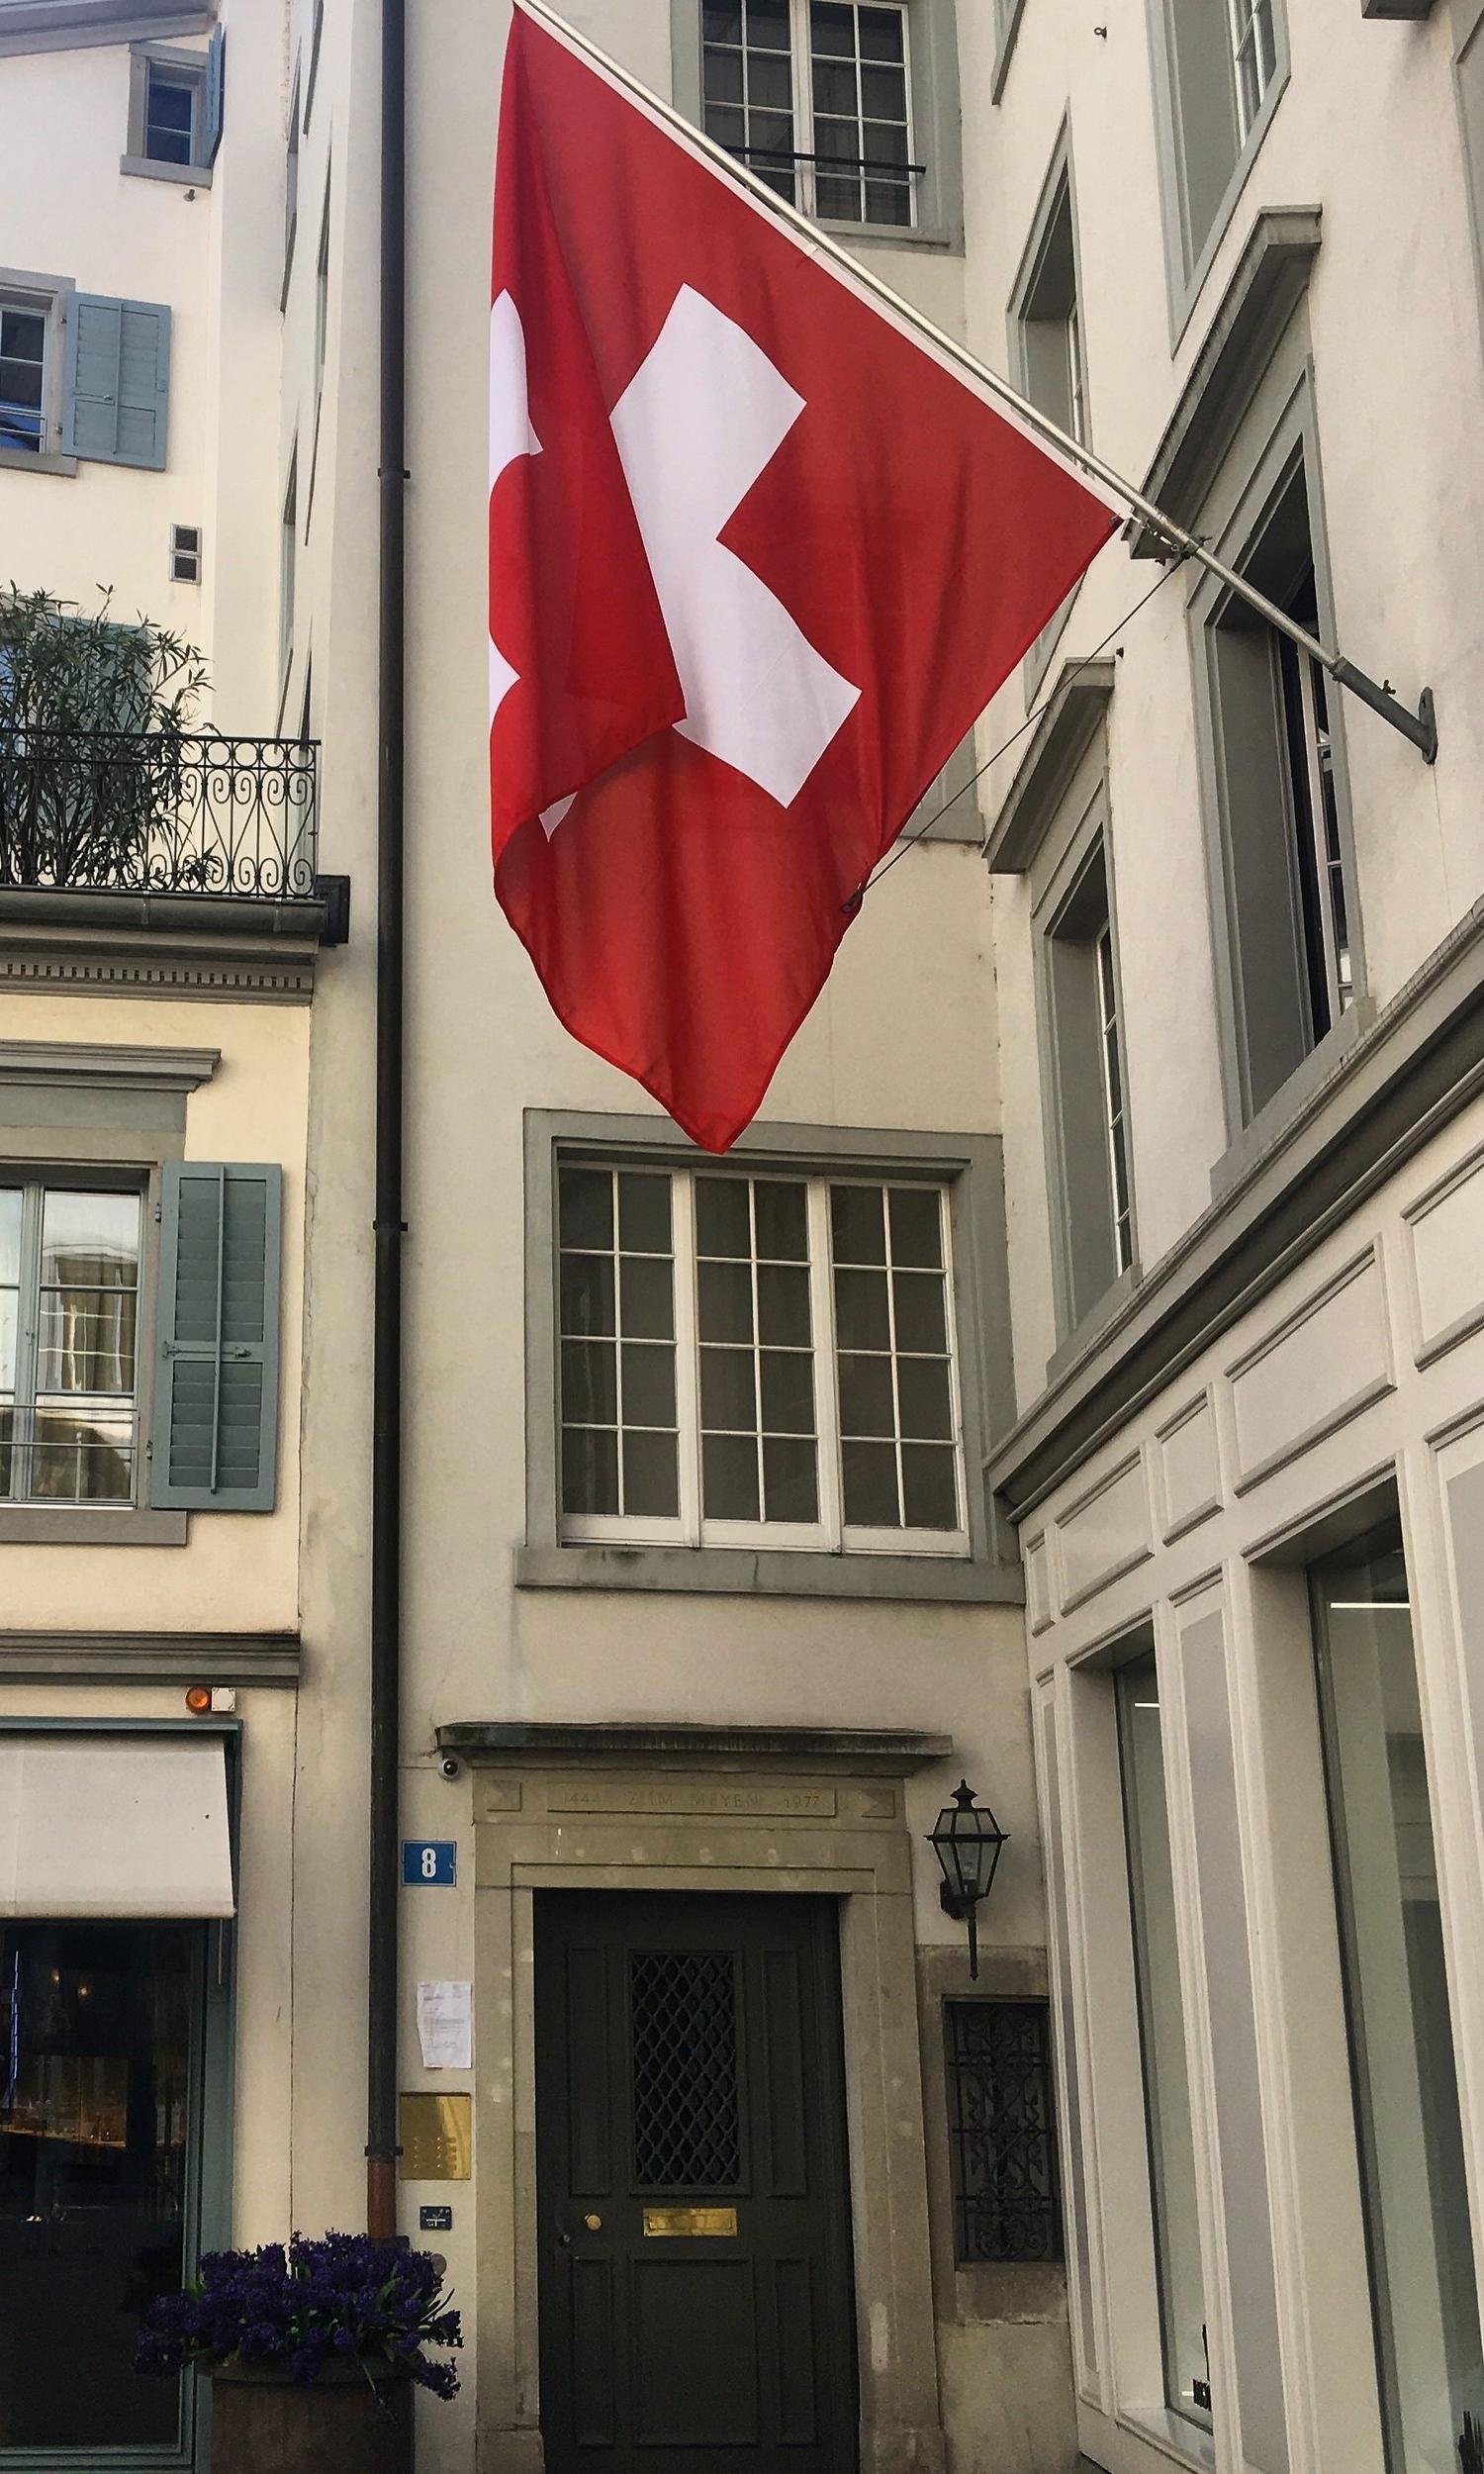 Swiss flag city center